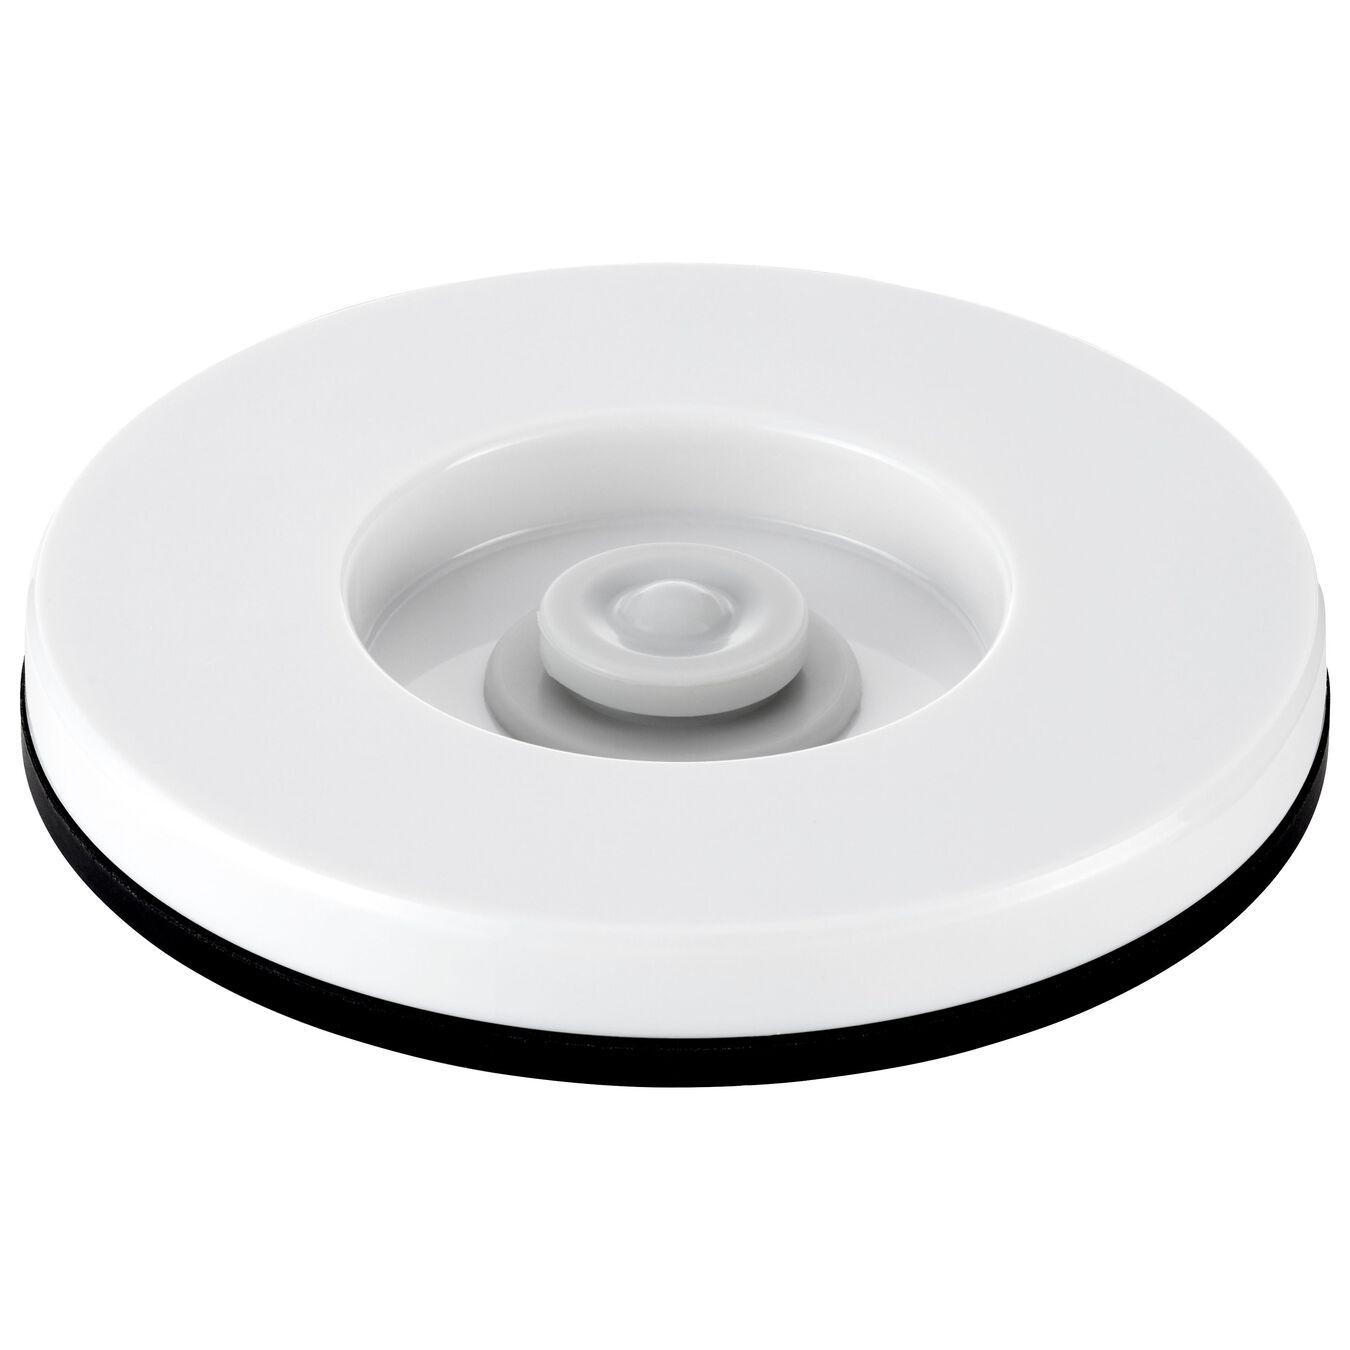 Adattatore per sottovuoto per il Table-/Power blender, ABS, bianco,,large 1